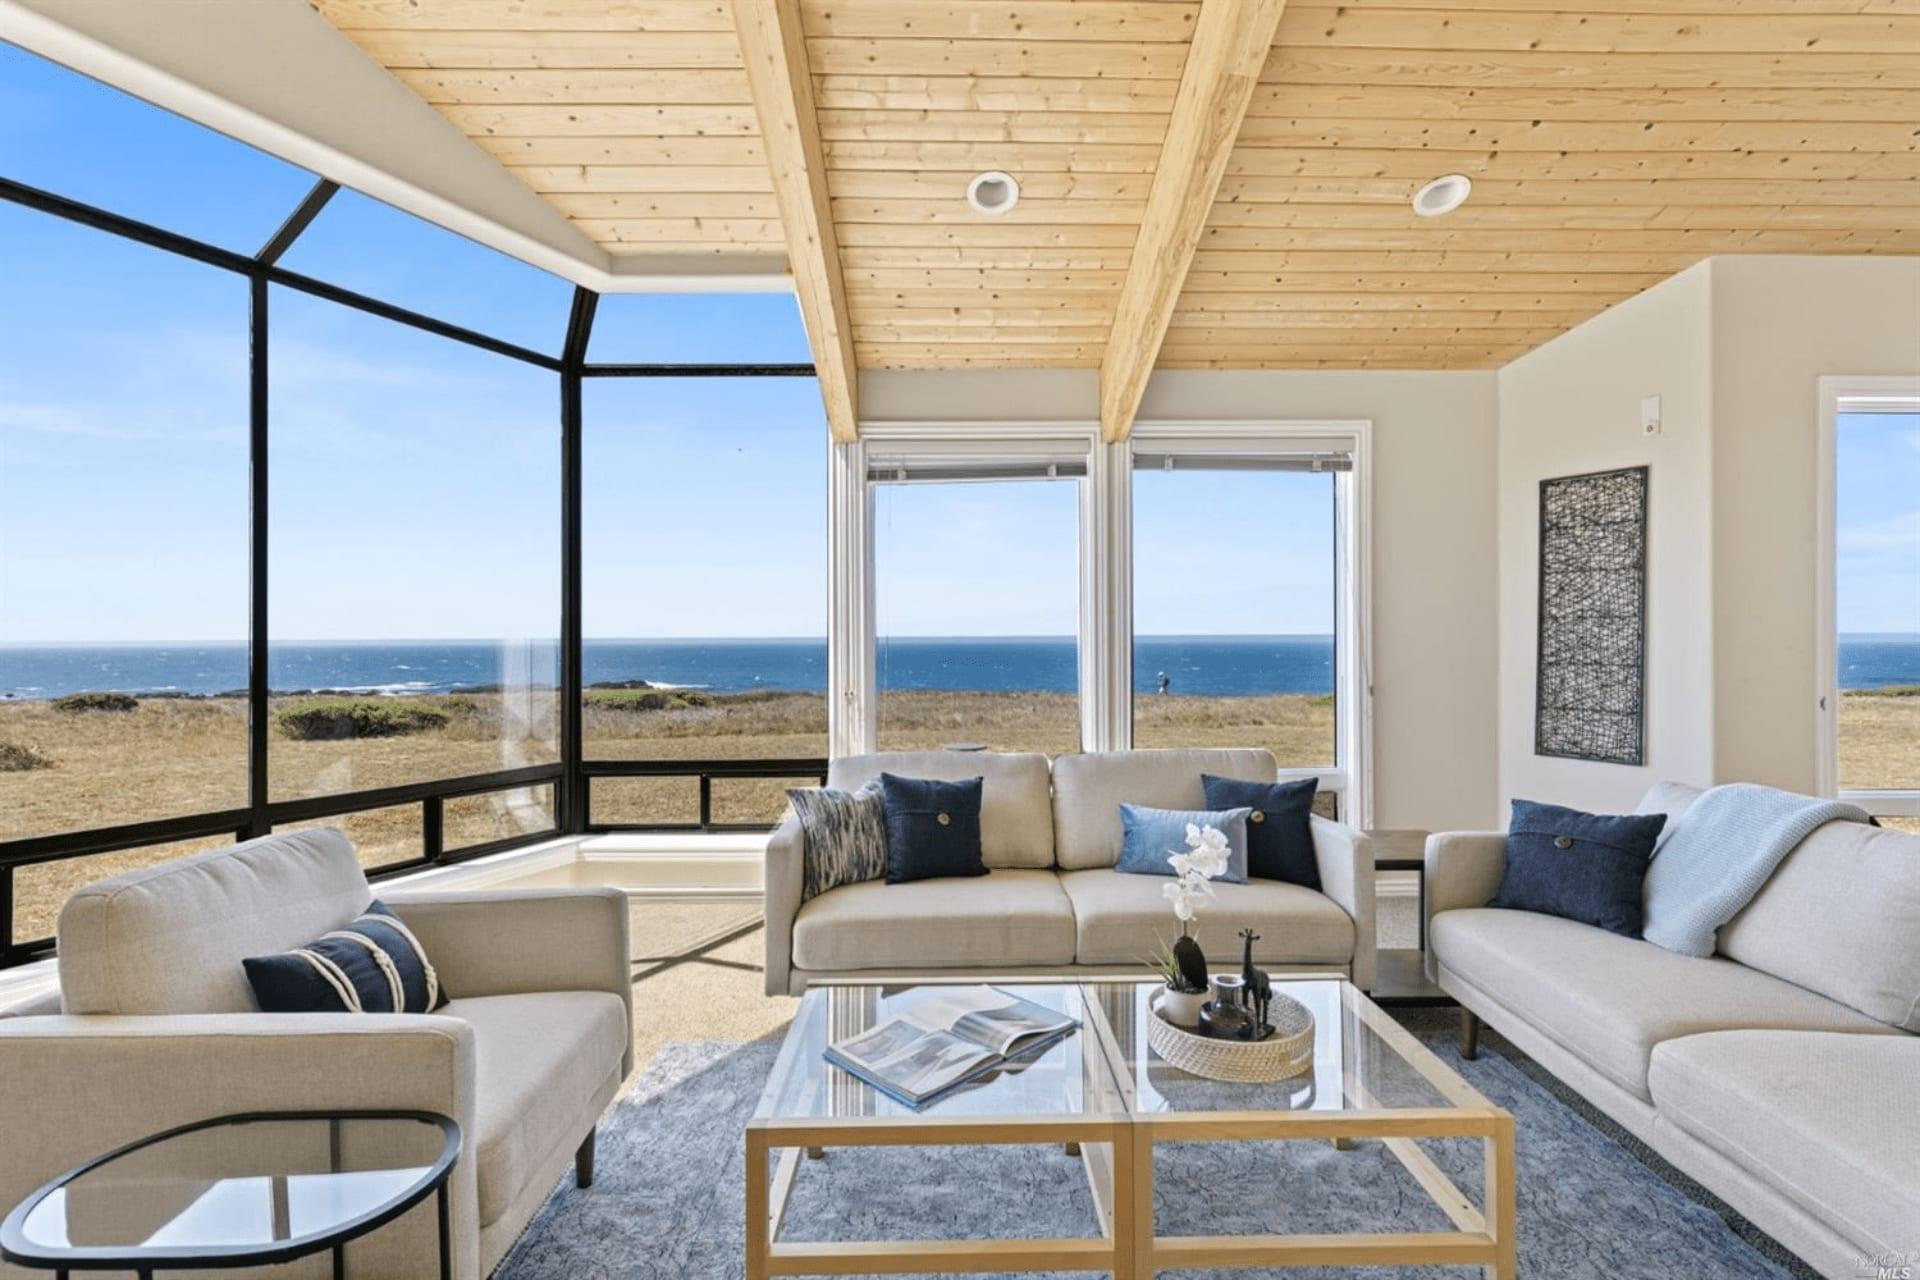 4 Ways to Market Your Coastal Home Online